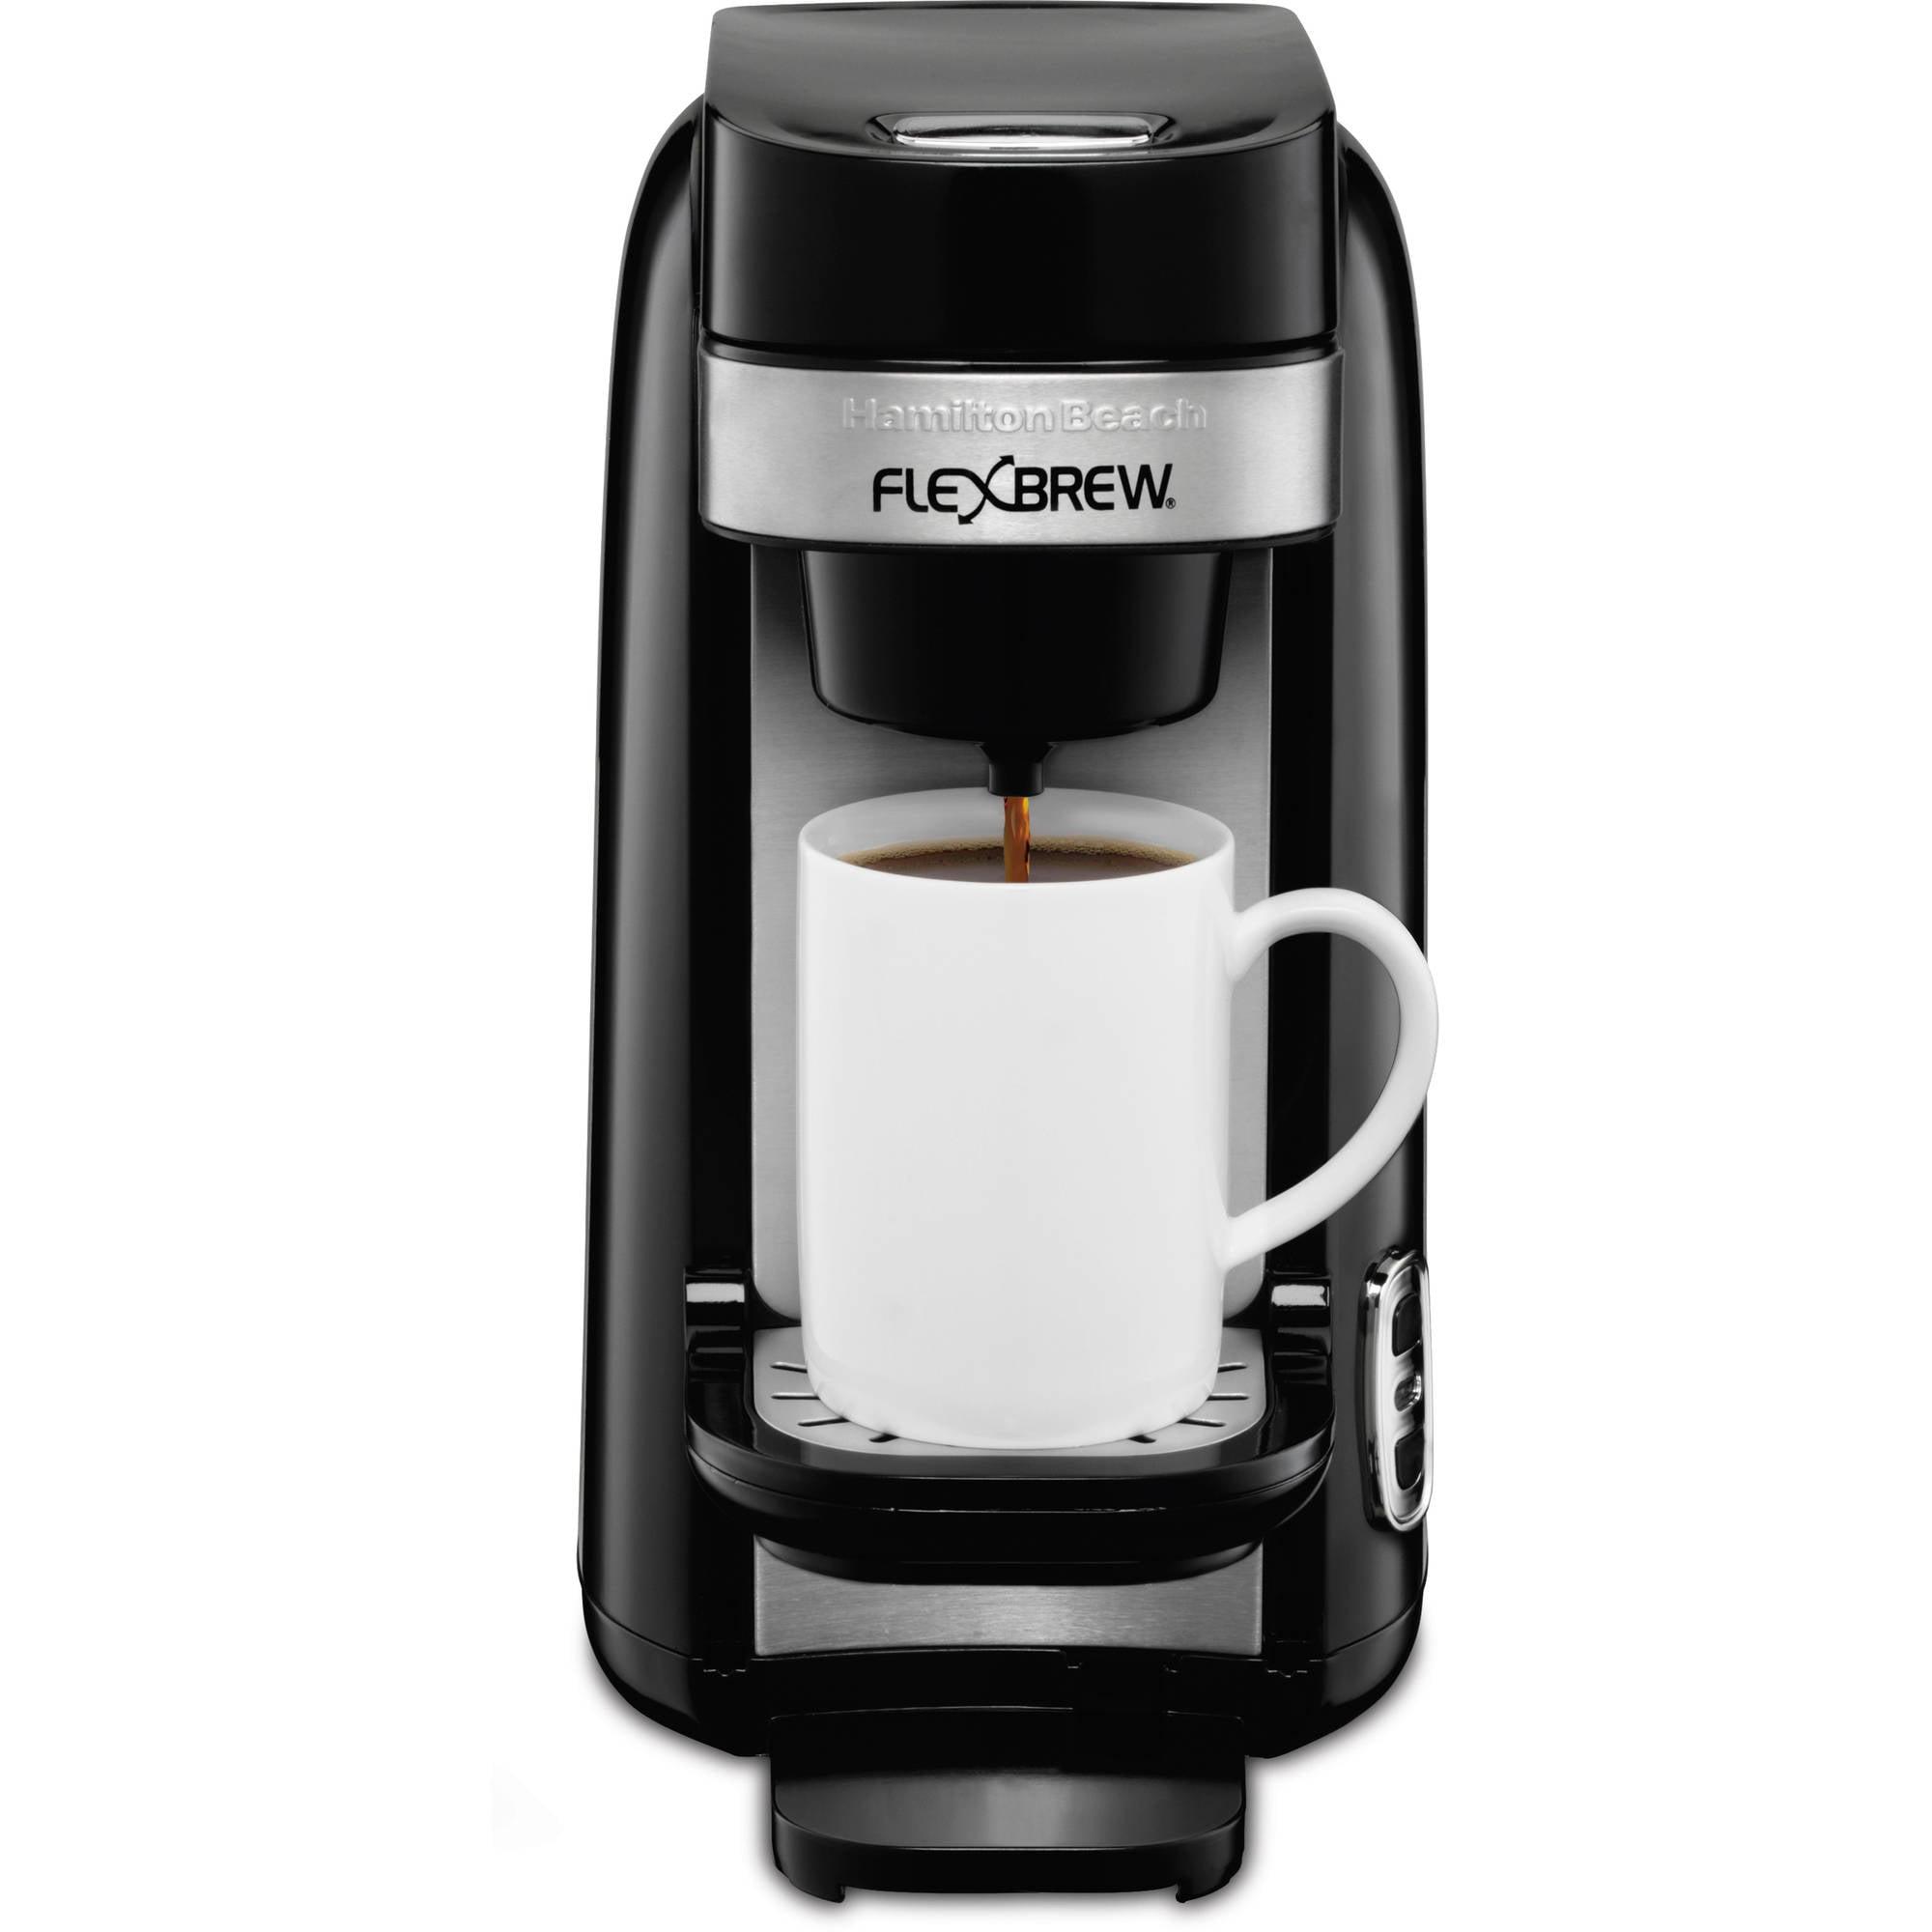 Hamilton Beach FlexBrew Single-Serve Coffee Maker | Model# 49997 ...